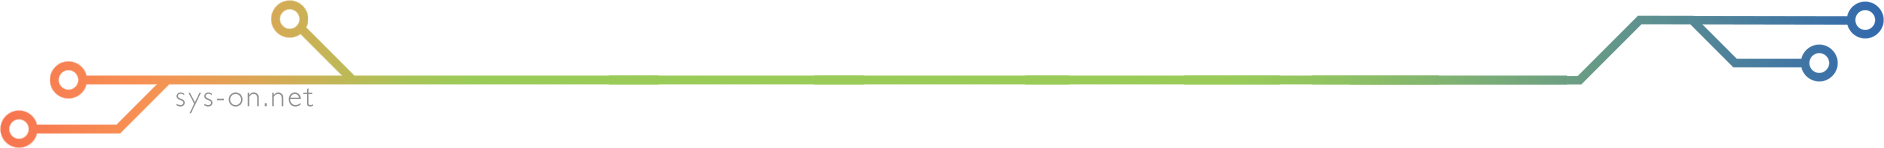 SeparatorNet - تطبيق Gboard يسمح لك بترجمة أي كلمة من خلال الكيبوورد دون الخروج من التطبيق الحالي